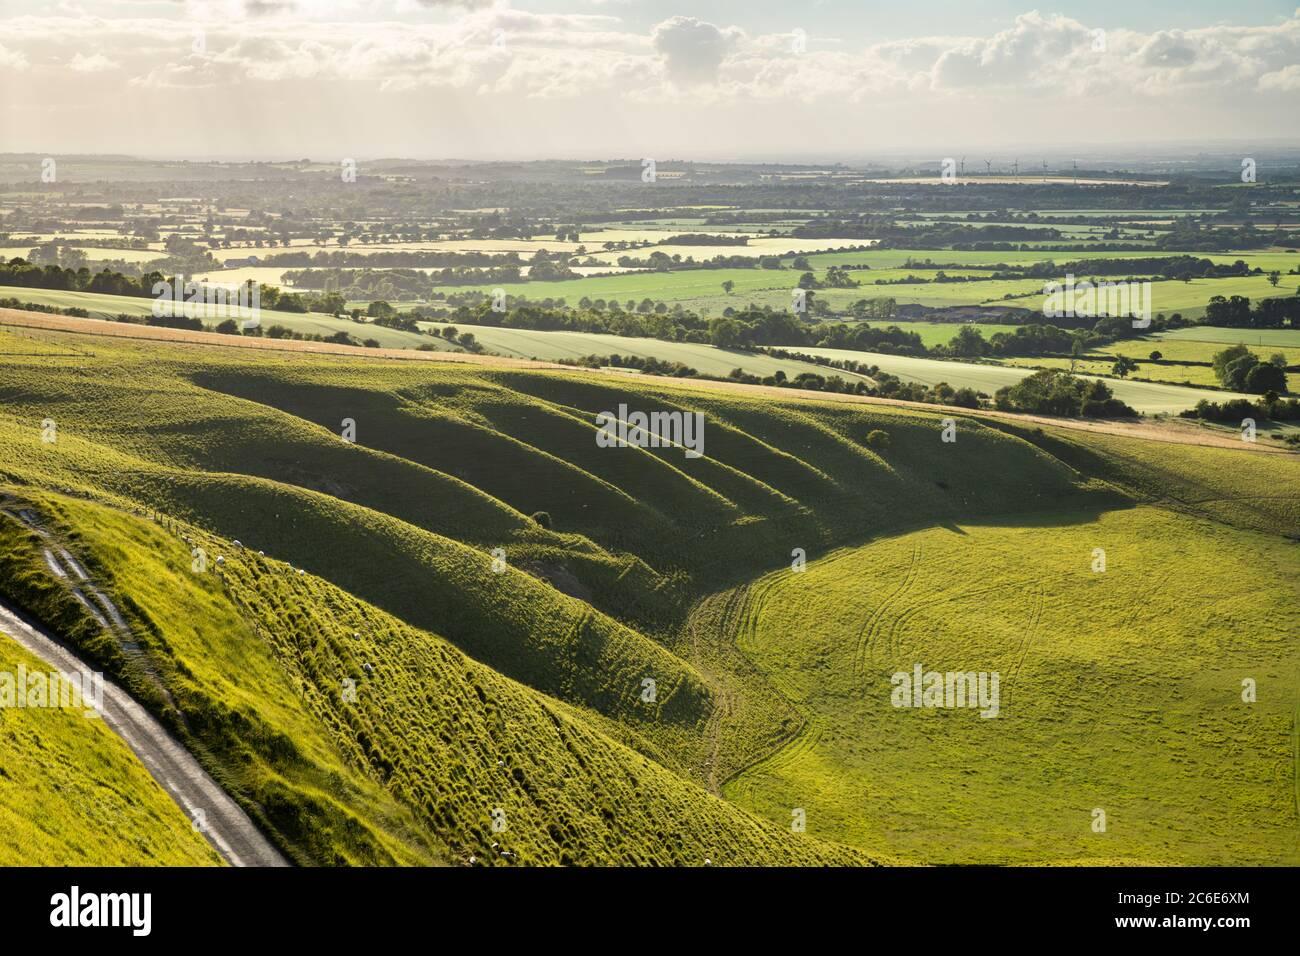 El pesebre y el valle del caballo blanco visto desde White Horse Hill, Uffington, Oxfordshire, Inglaterra, Reino Unido, Europa Foto de stock